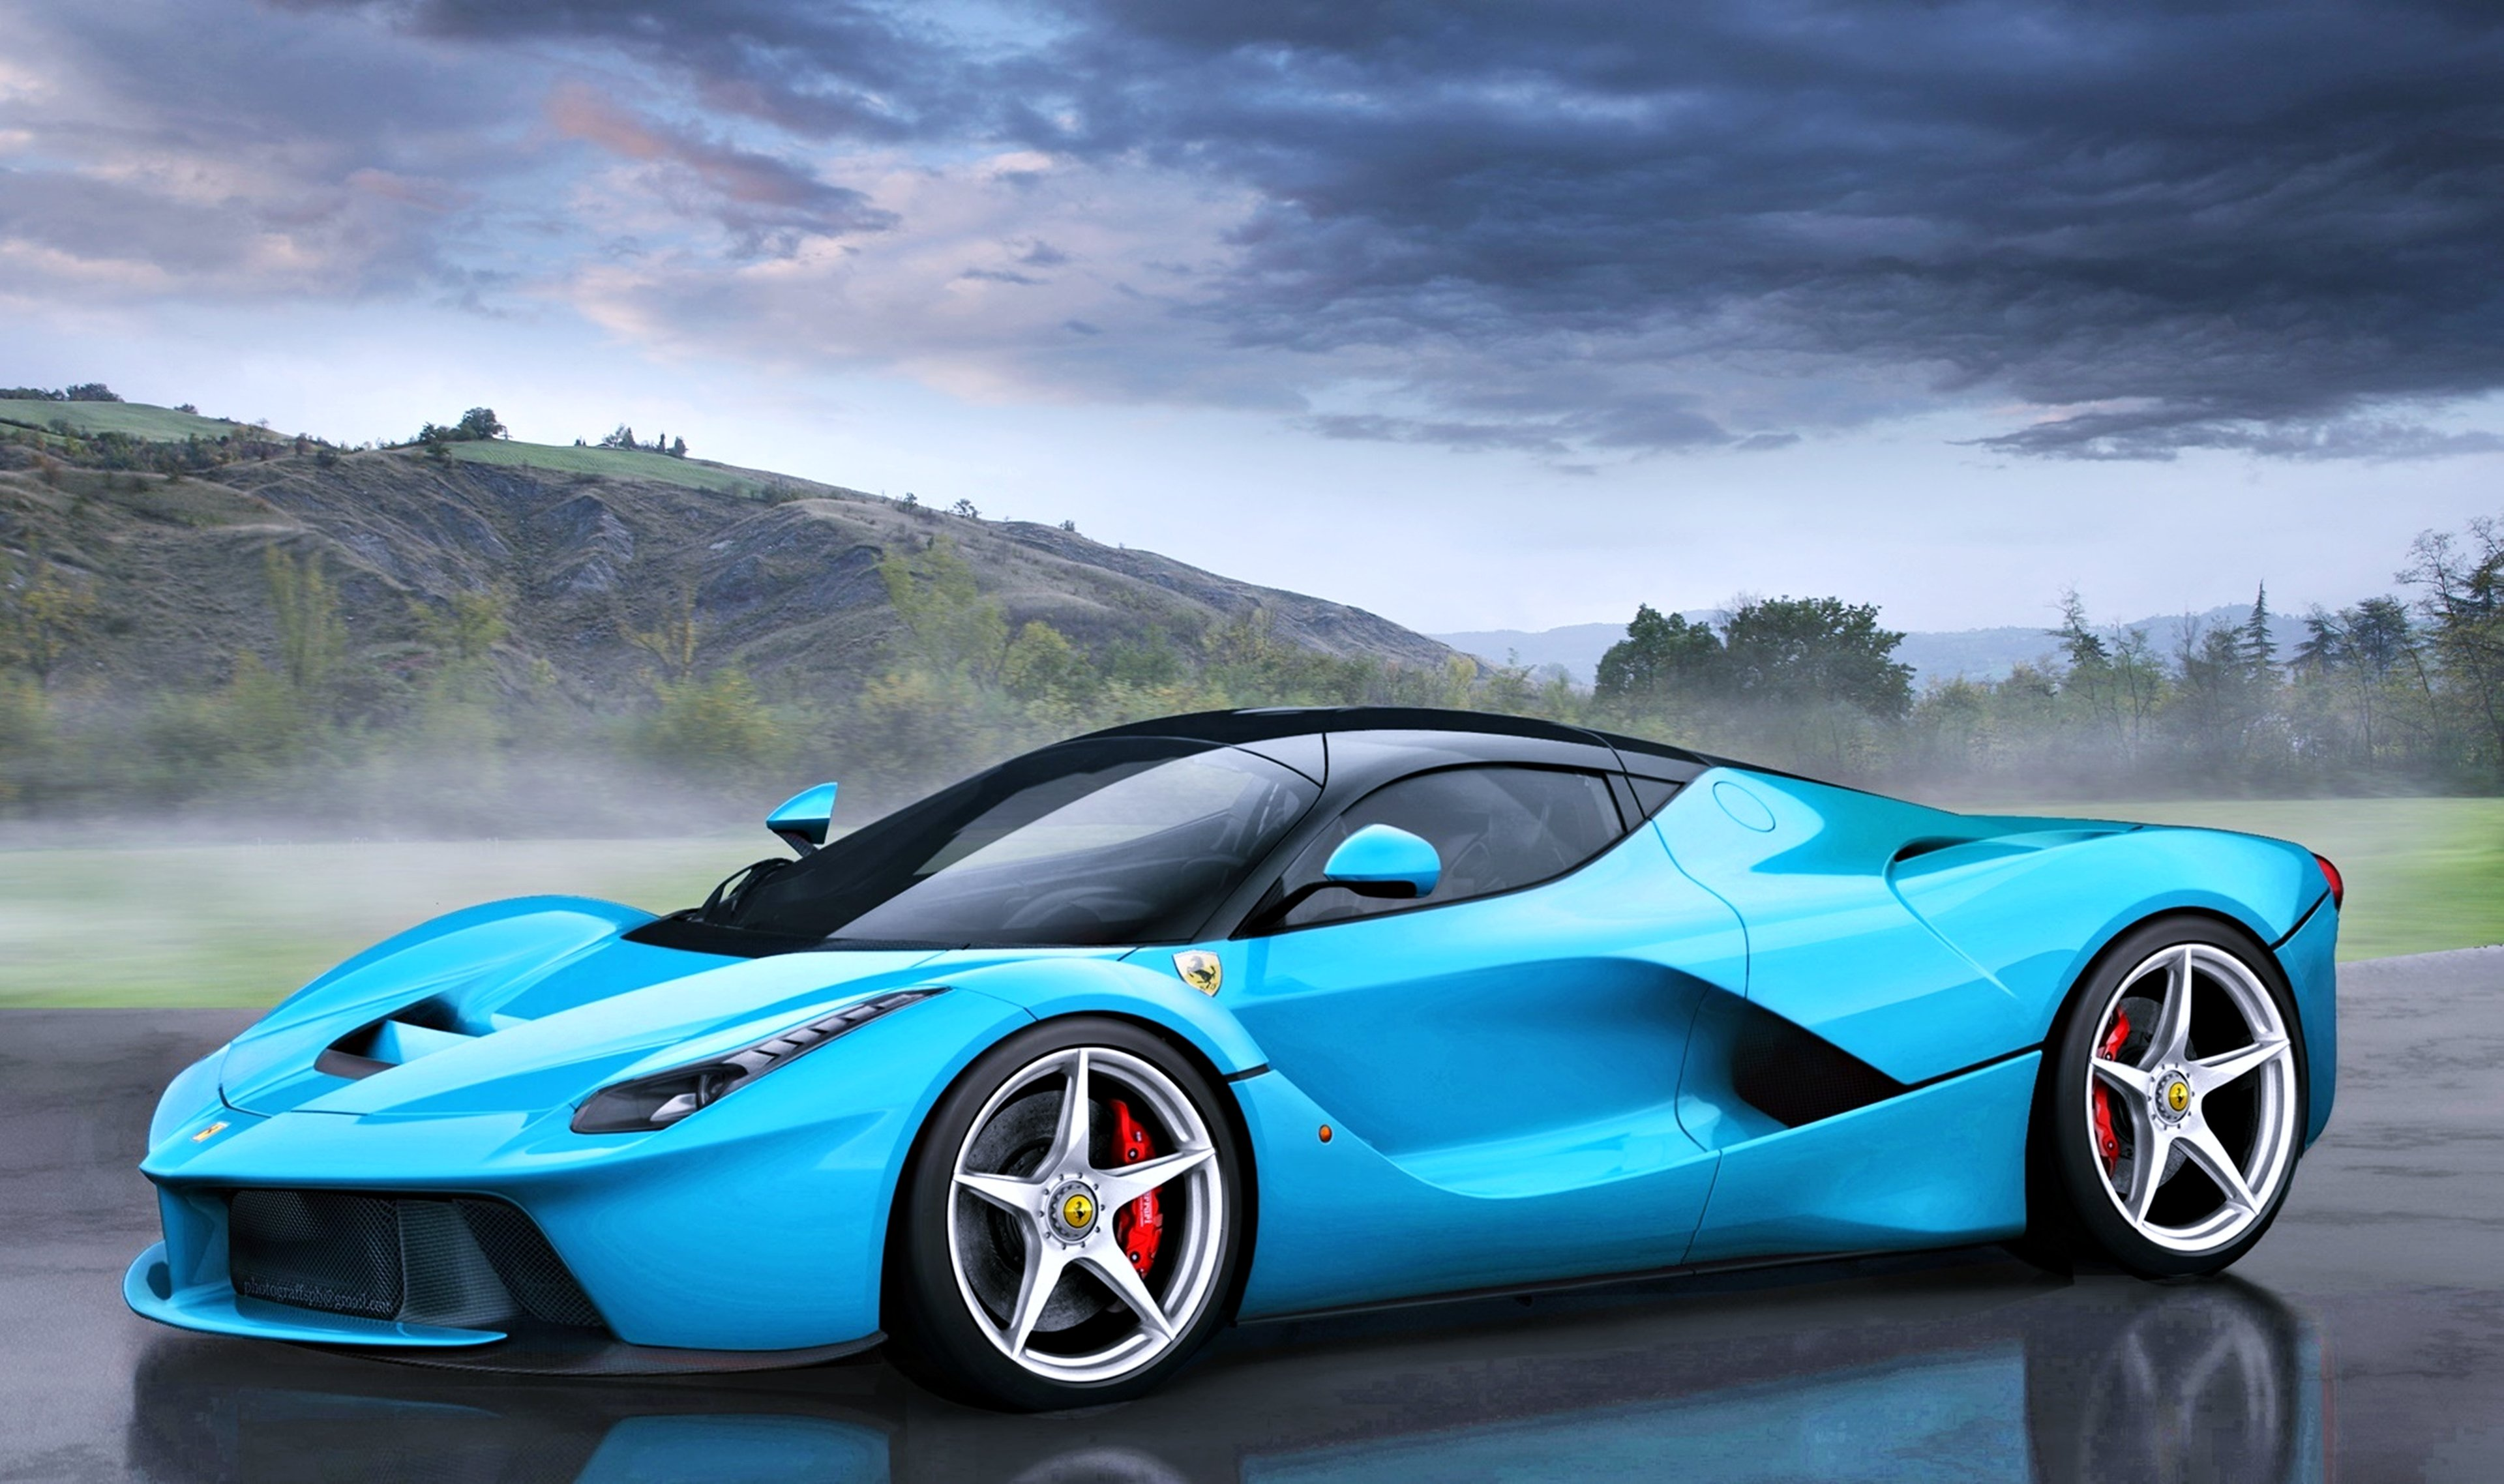 Ferrari Laferrari Tiffany Blue Fog Speed Cars Motors Race Super Wallpaper 3840x2276 622950